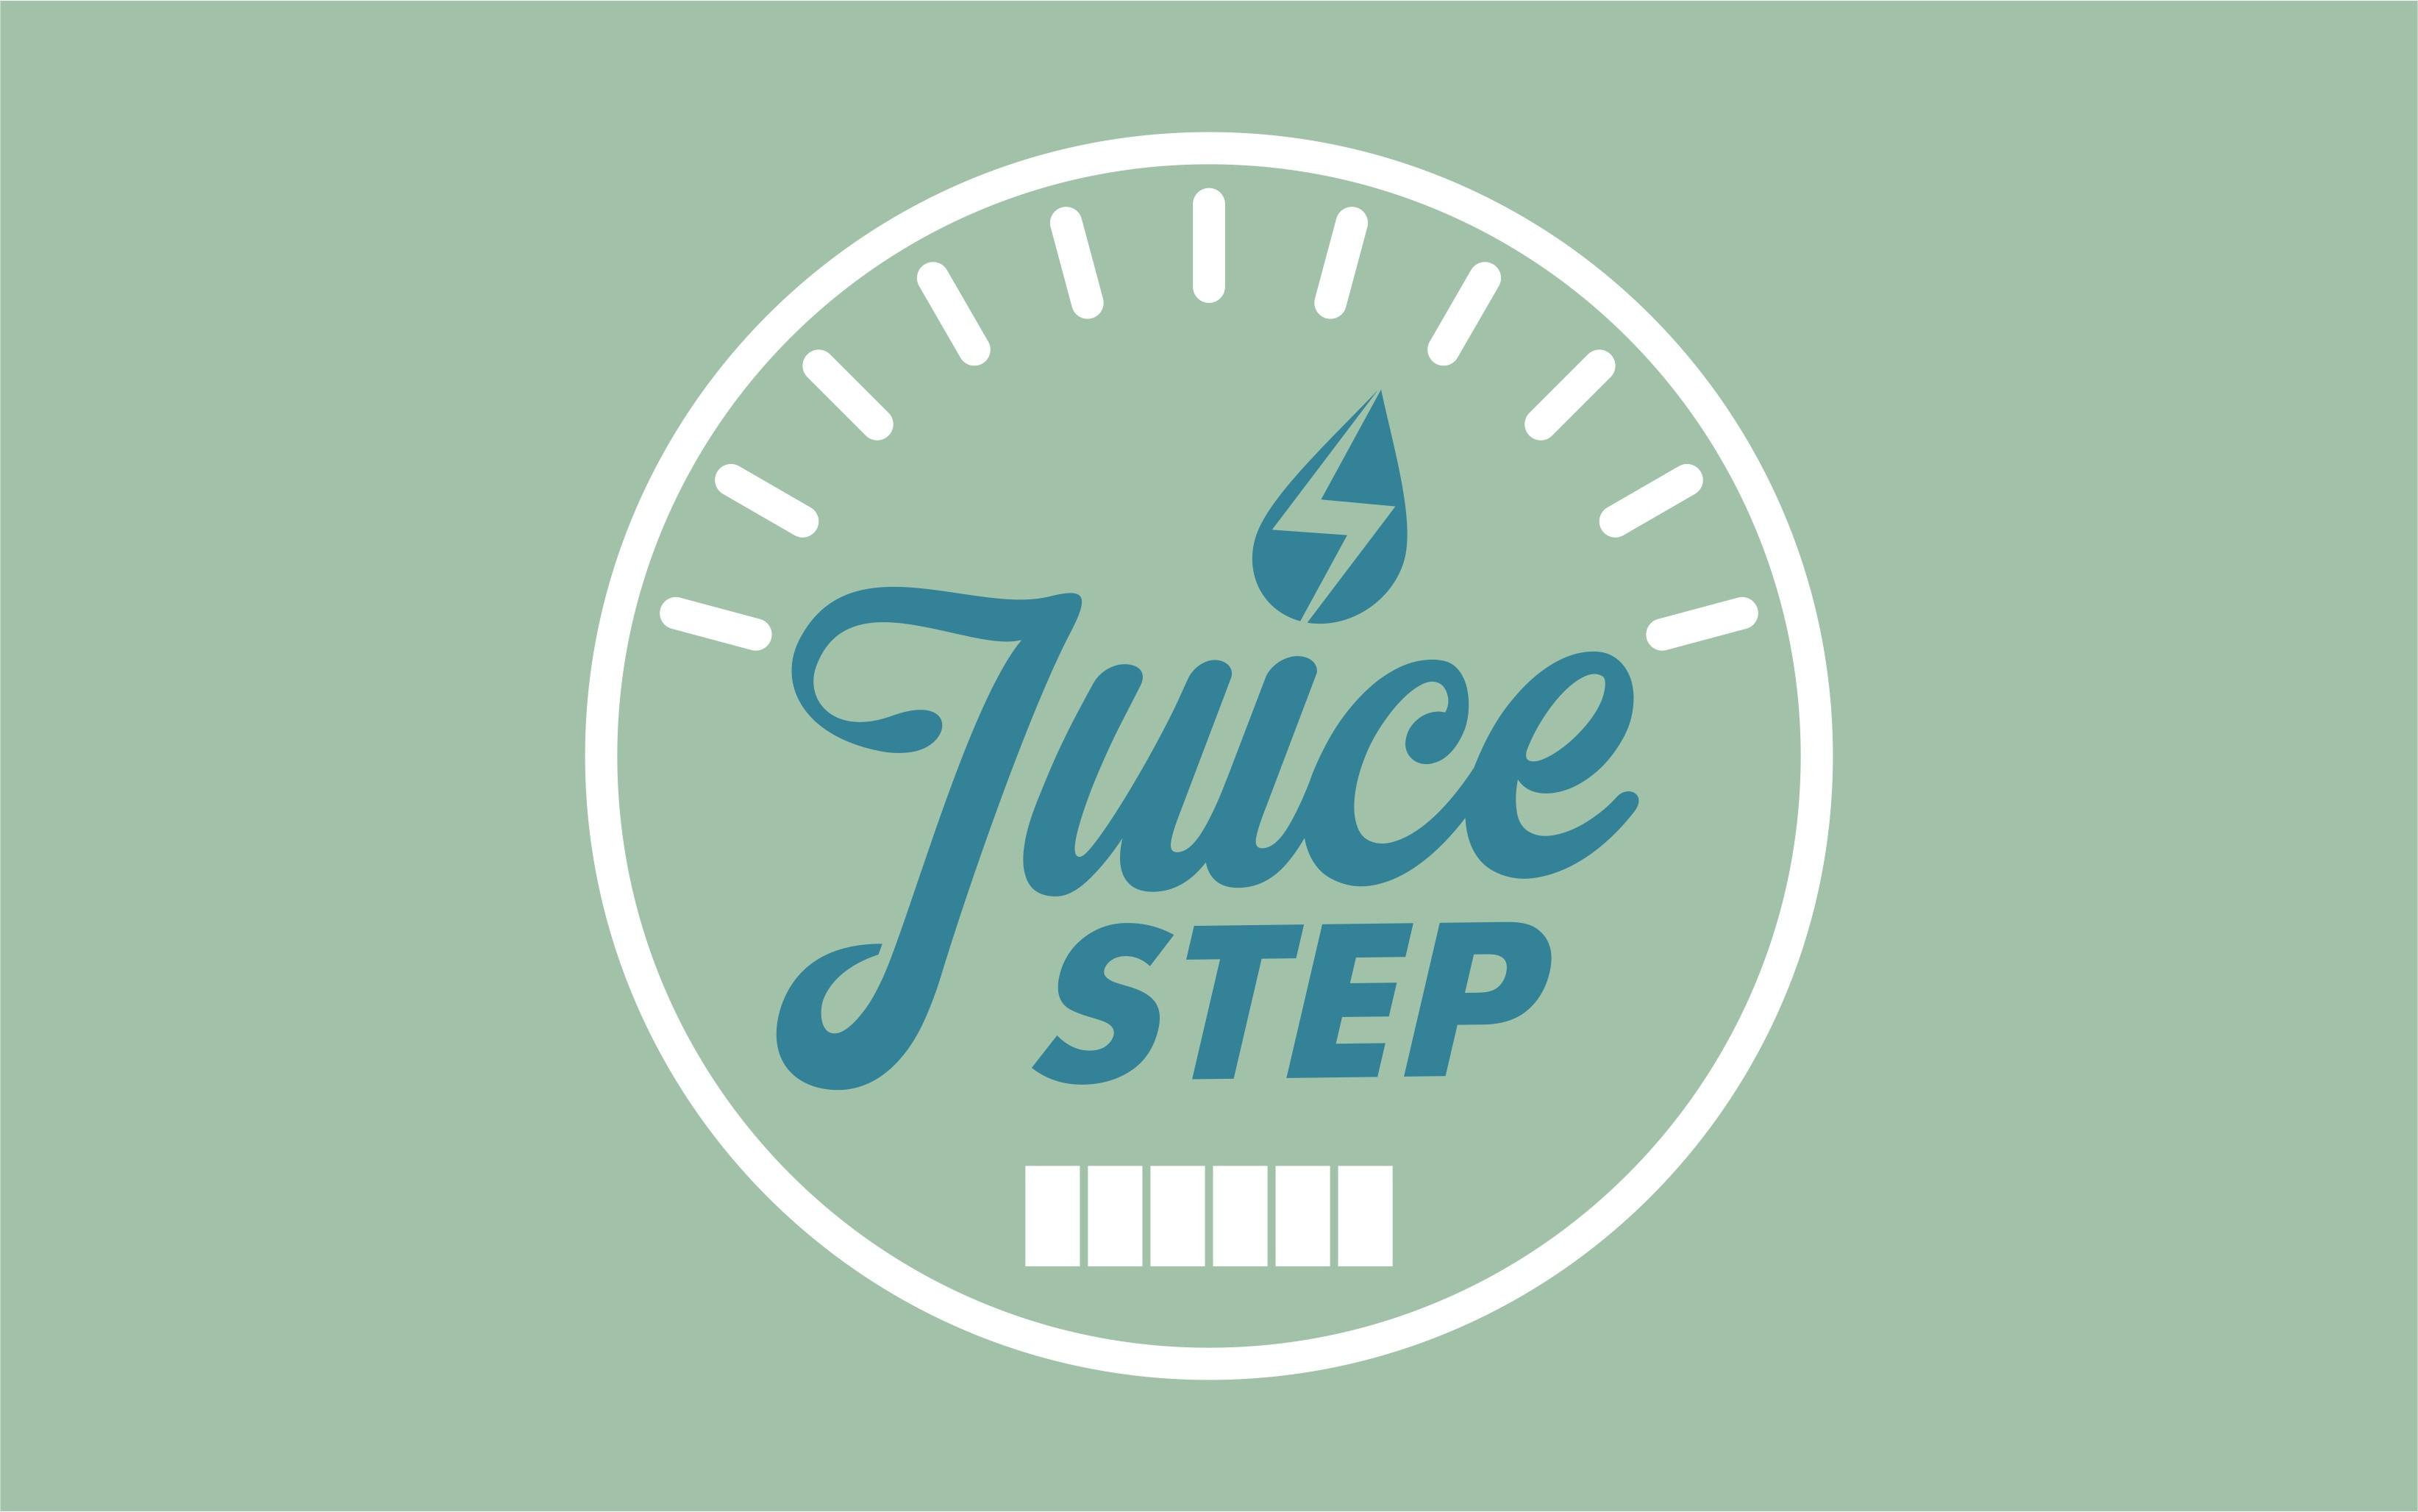 Extra Juice Logos